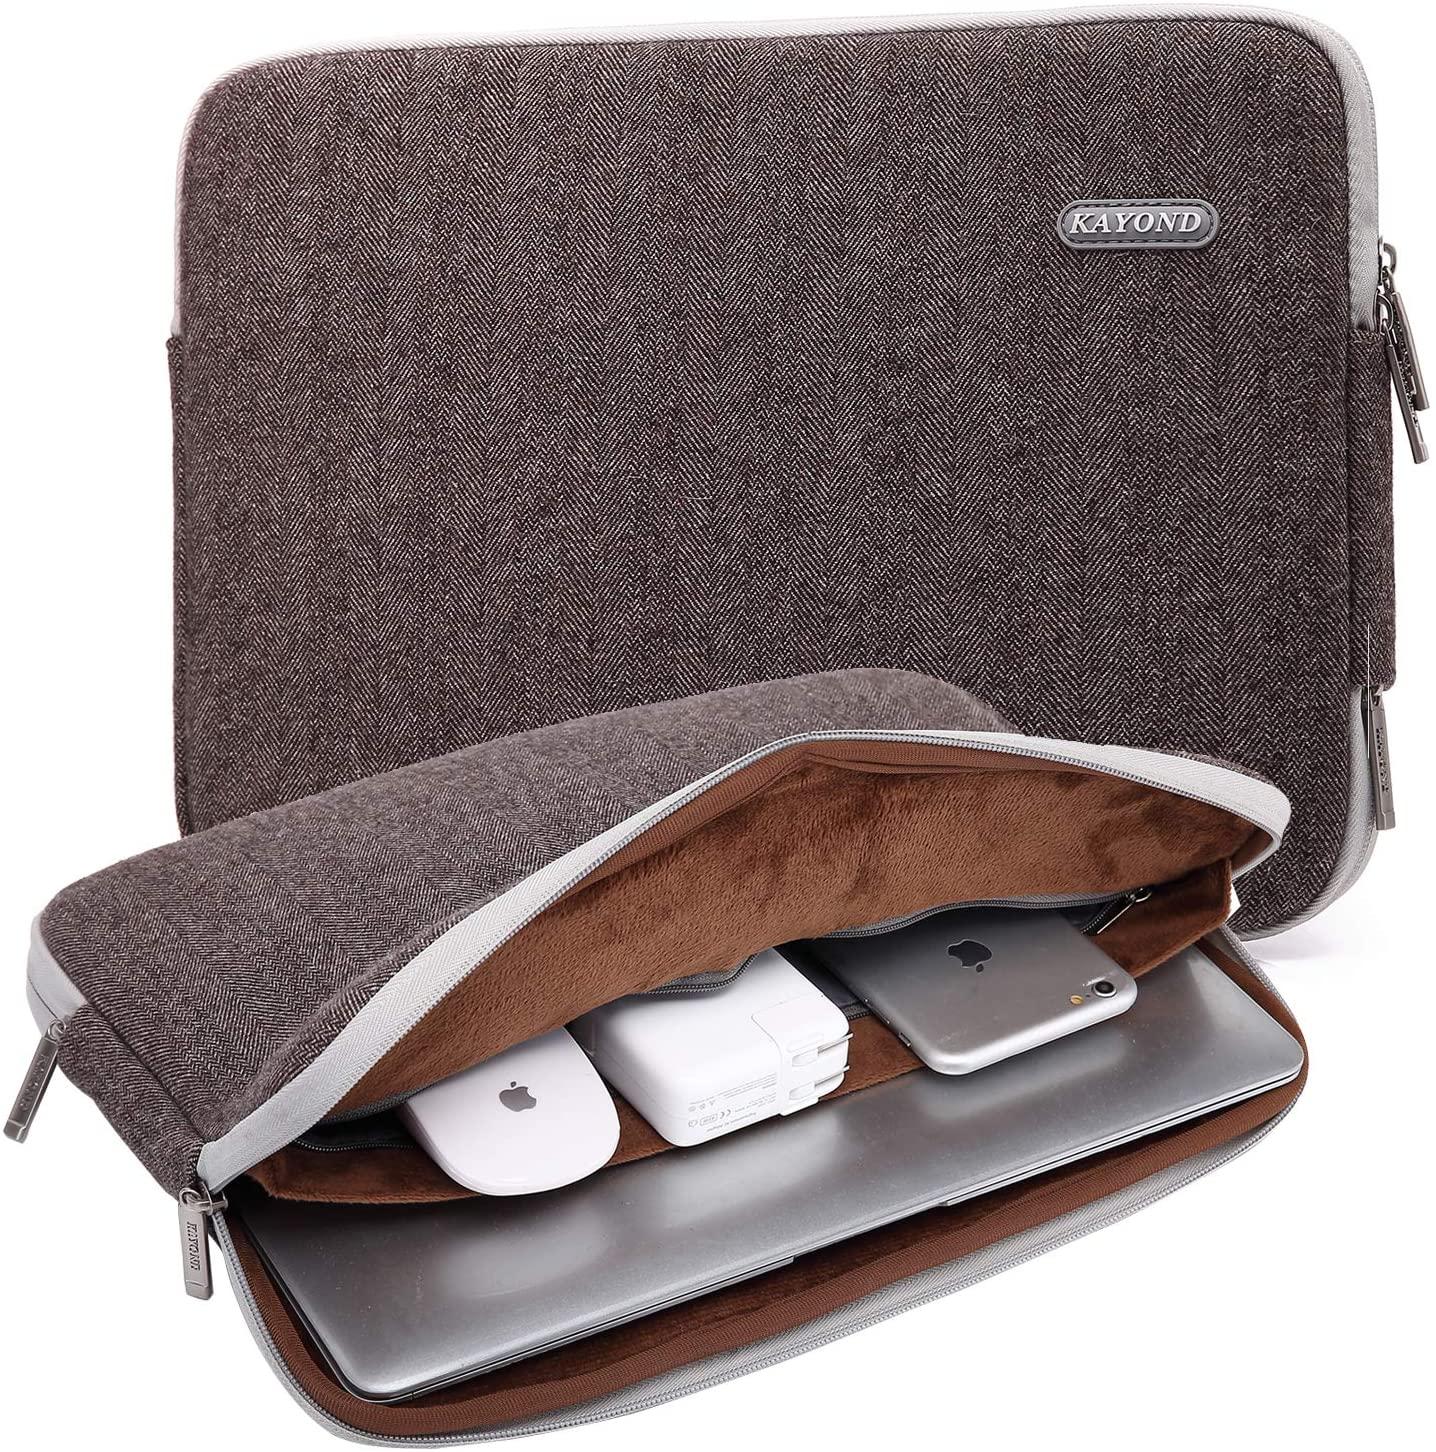 KAYOND Herringbone Woollen Water-Resistant for 13-13.3 Inch Laptop Sleeve Case Bag (13-13.3 Inches, Brown)